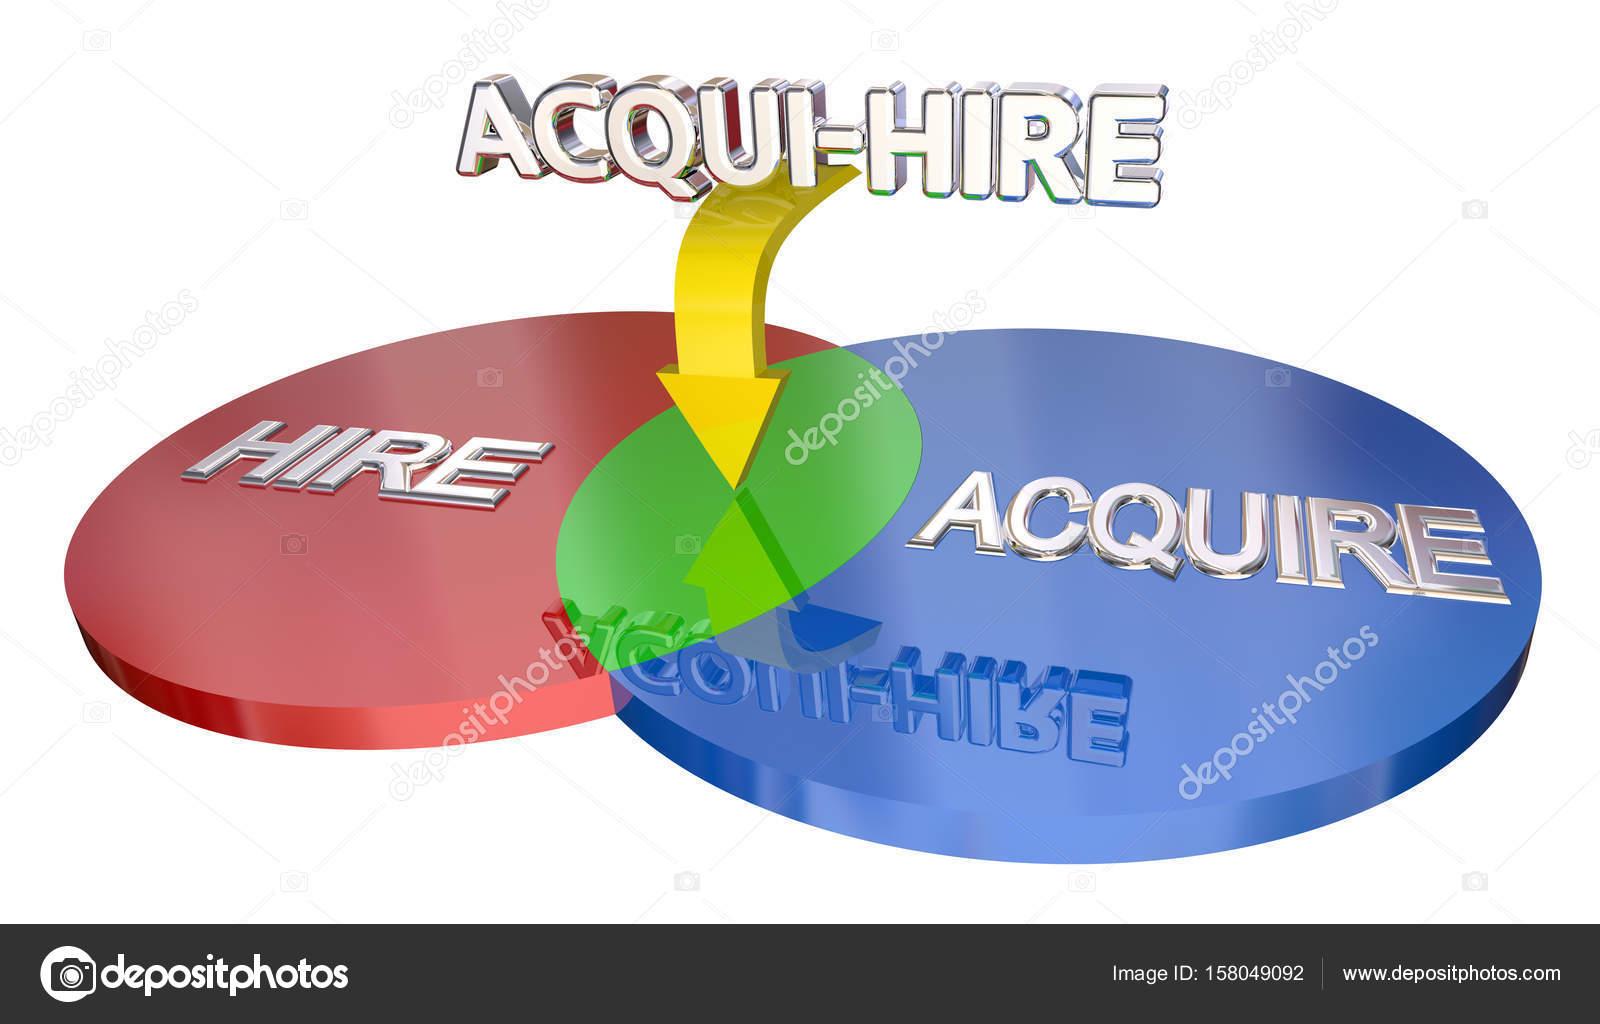 Diagrama de venn acqui aluguer stock photo iqoncept 158049092 diagrama de venn acqui aluguer illustrationg 3d foto de iqoncept ccuart Gallery